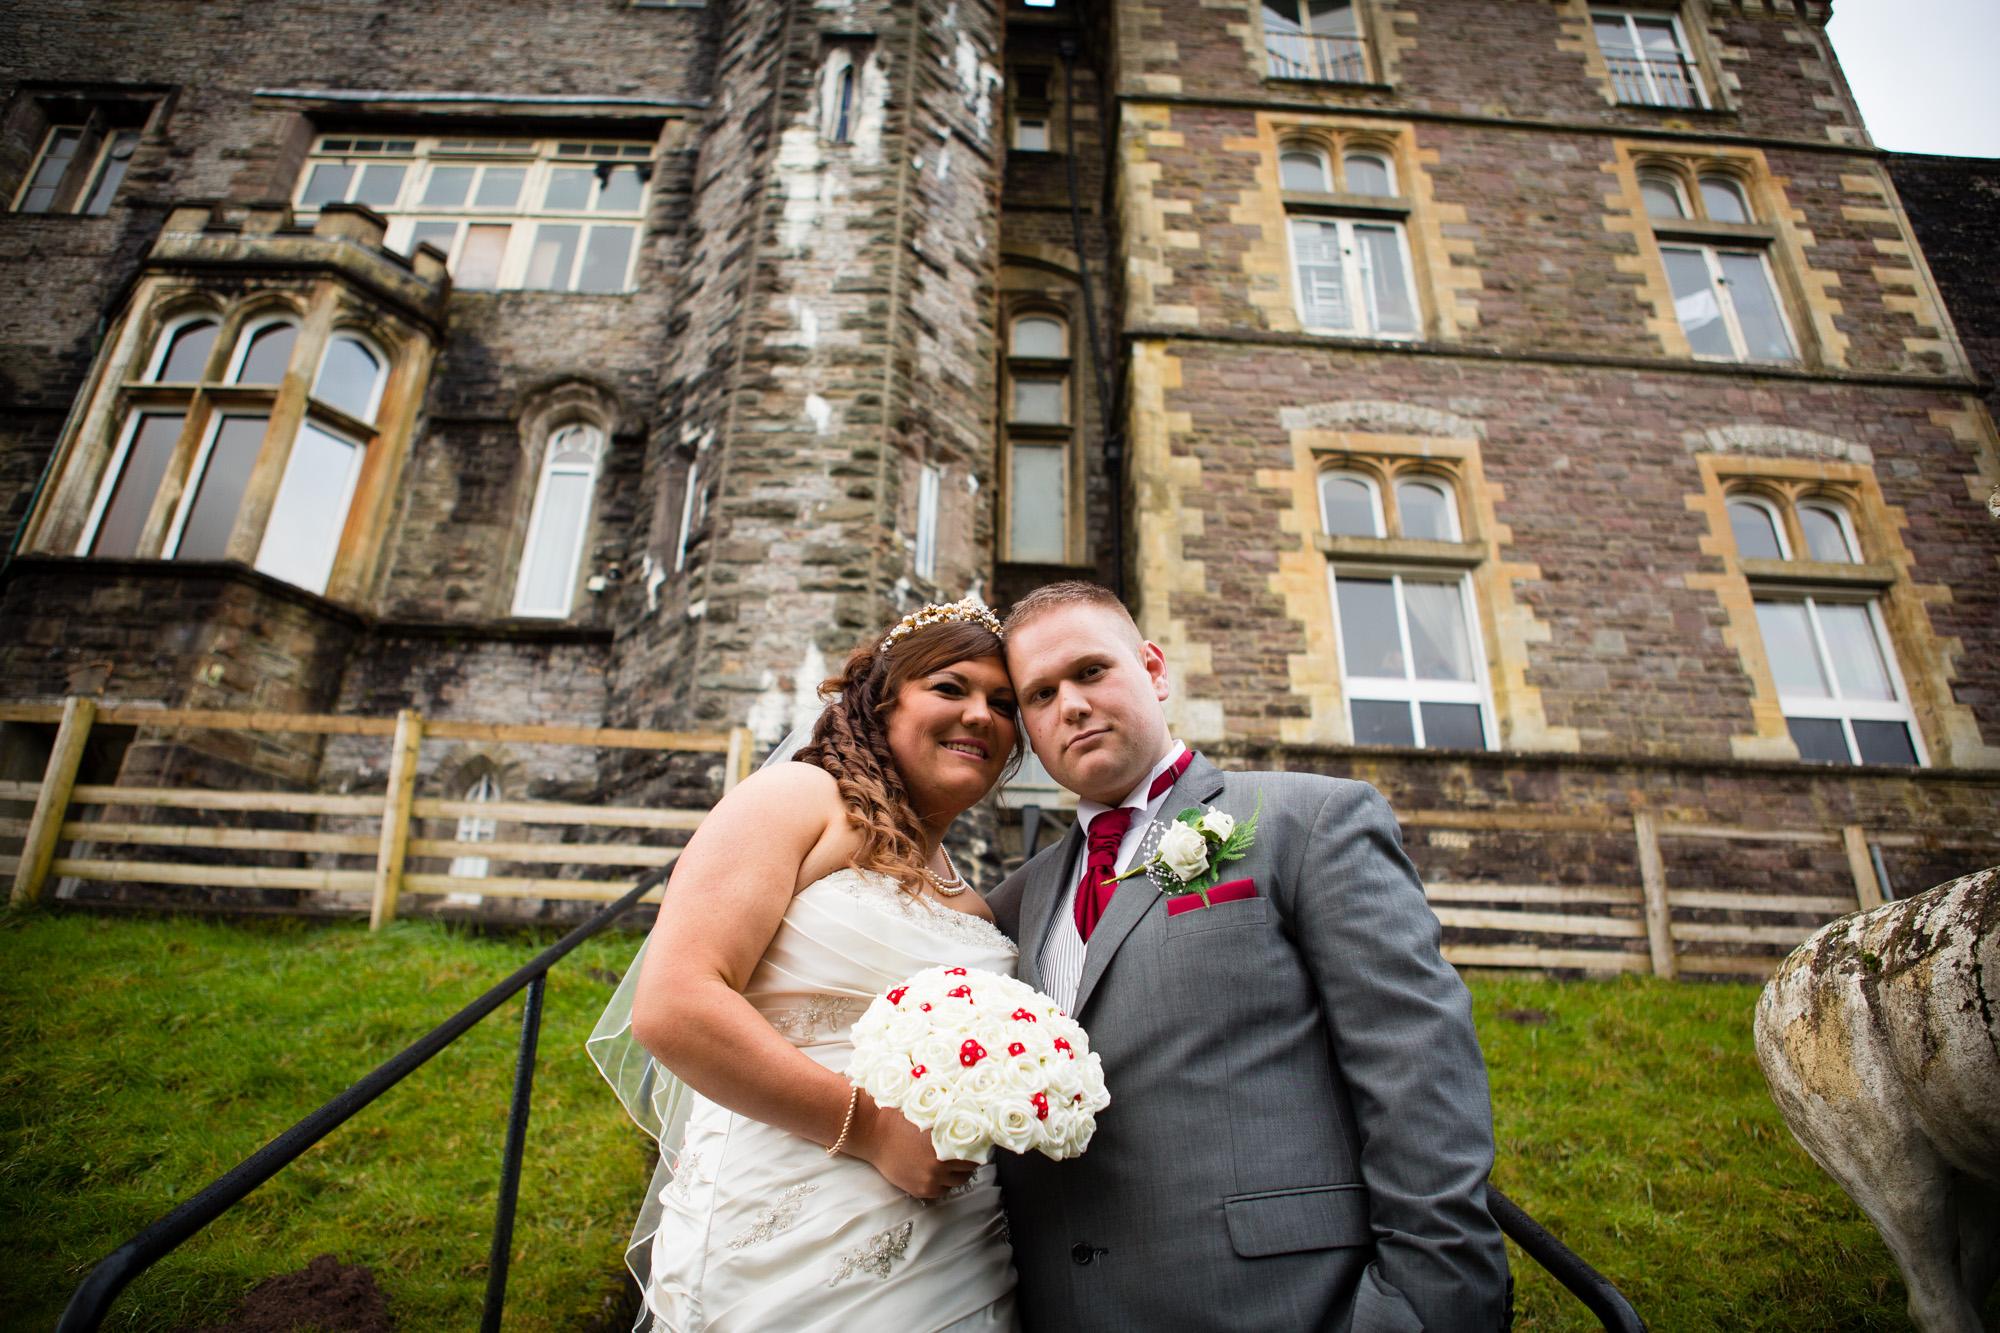 South Wales Wedding Photograher at Craig Y Nos Castle (29)